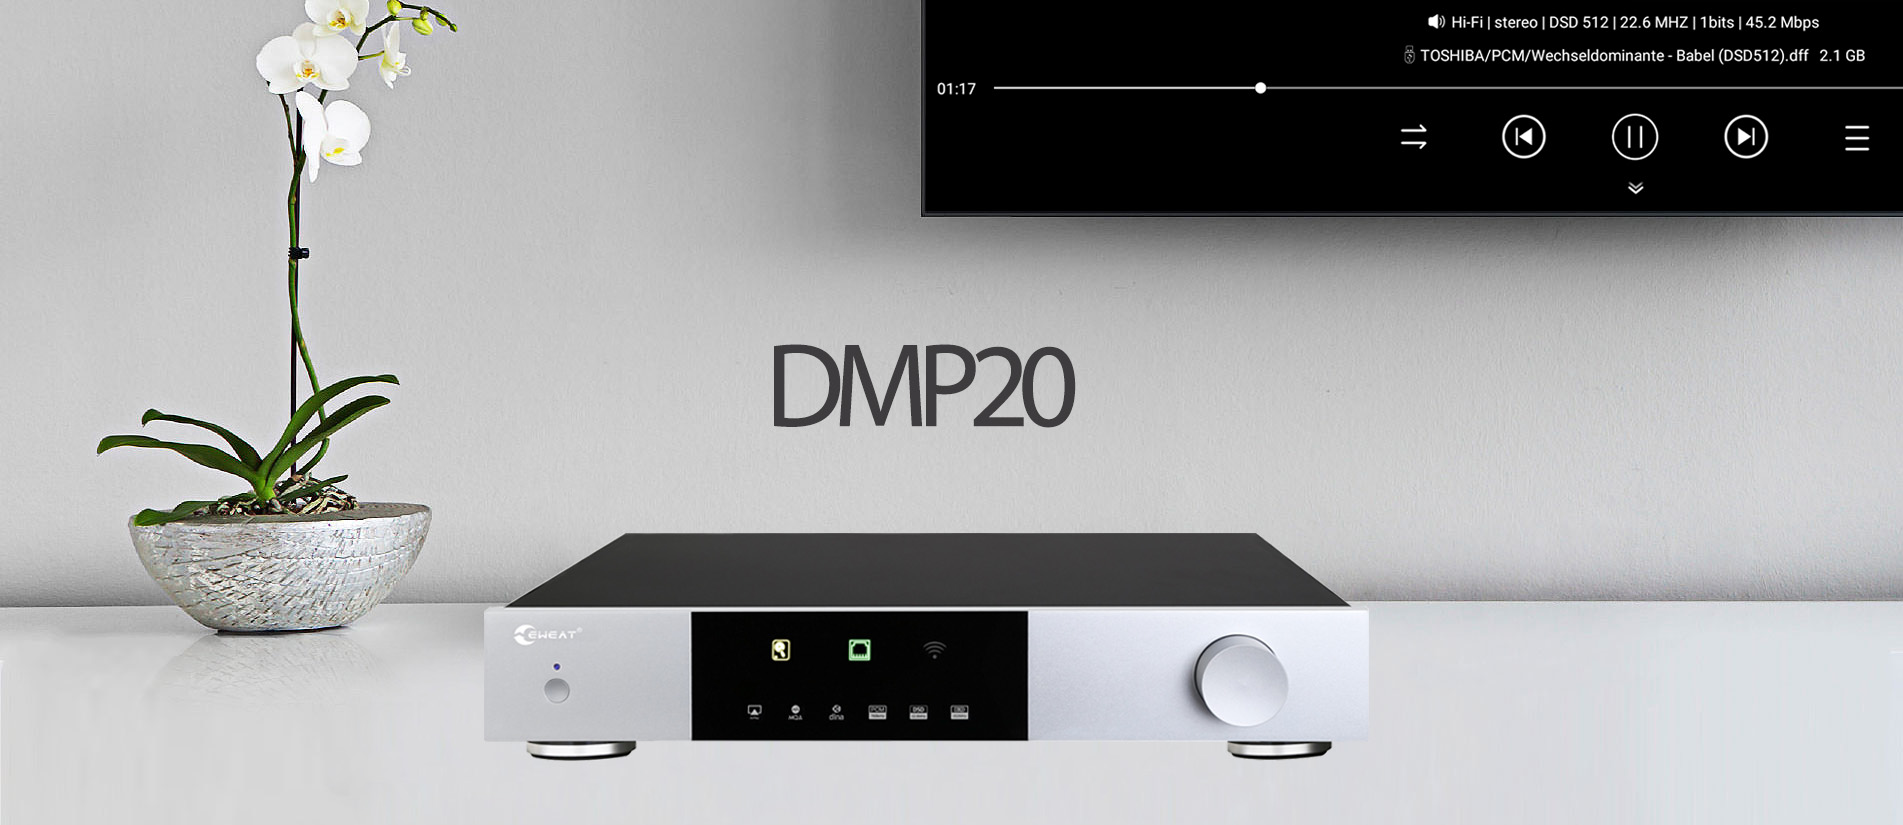 DMP20-HIFI-DIGITAL-MUSIC-PLAYER-2